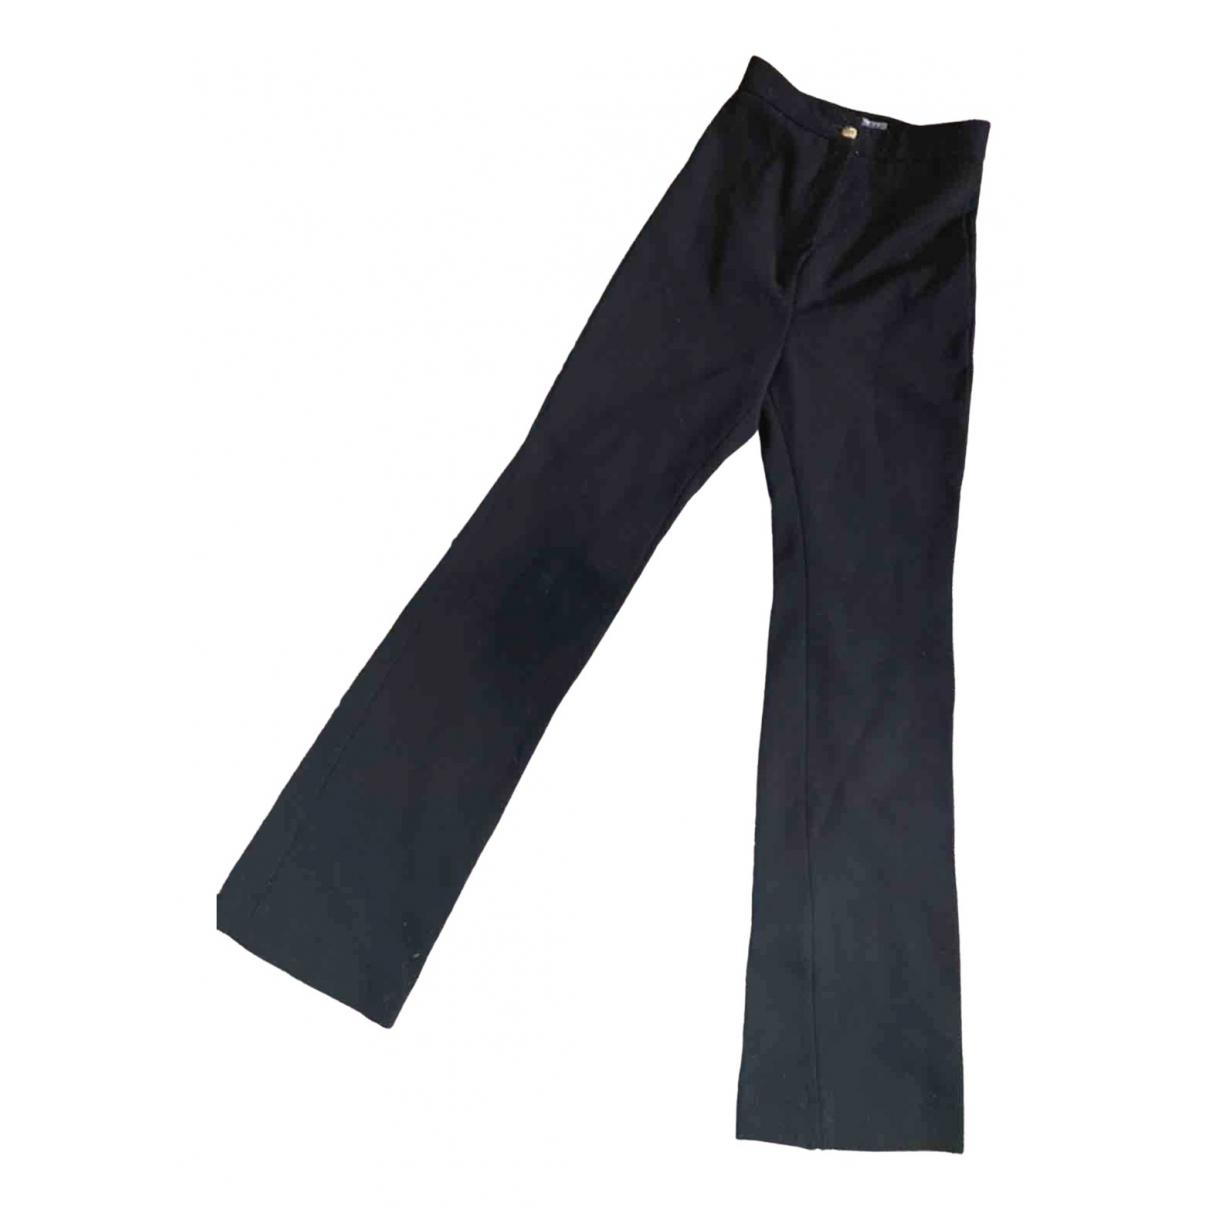 Acne Studios \N Black Spandex Trousers for Women 36 FR